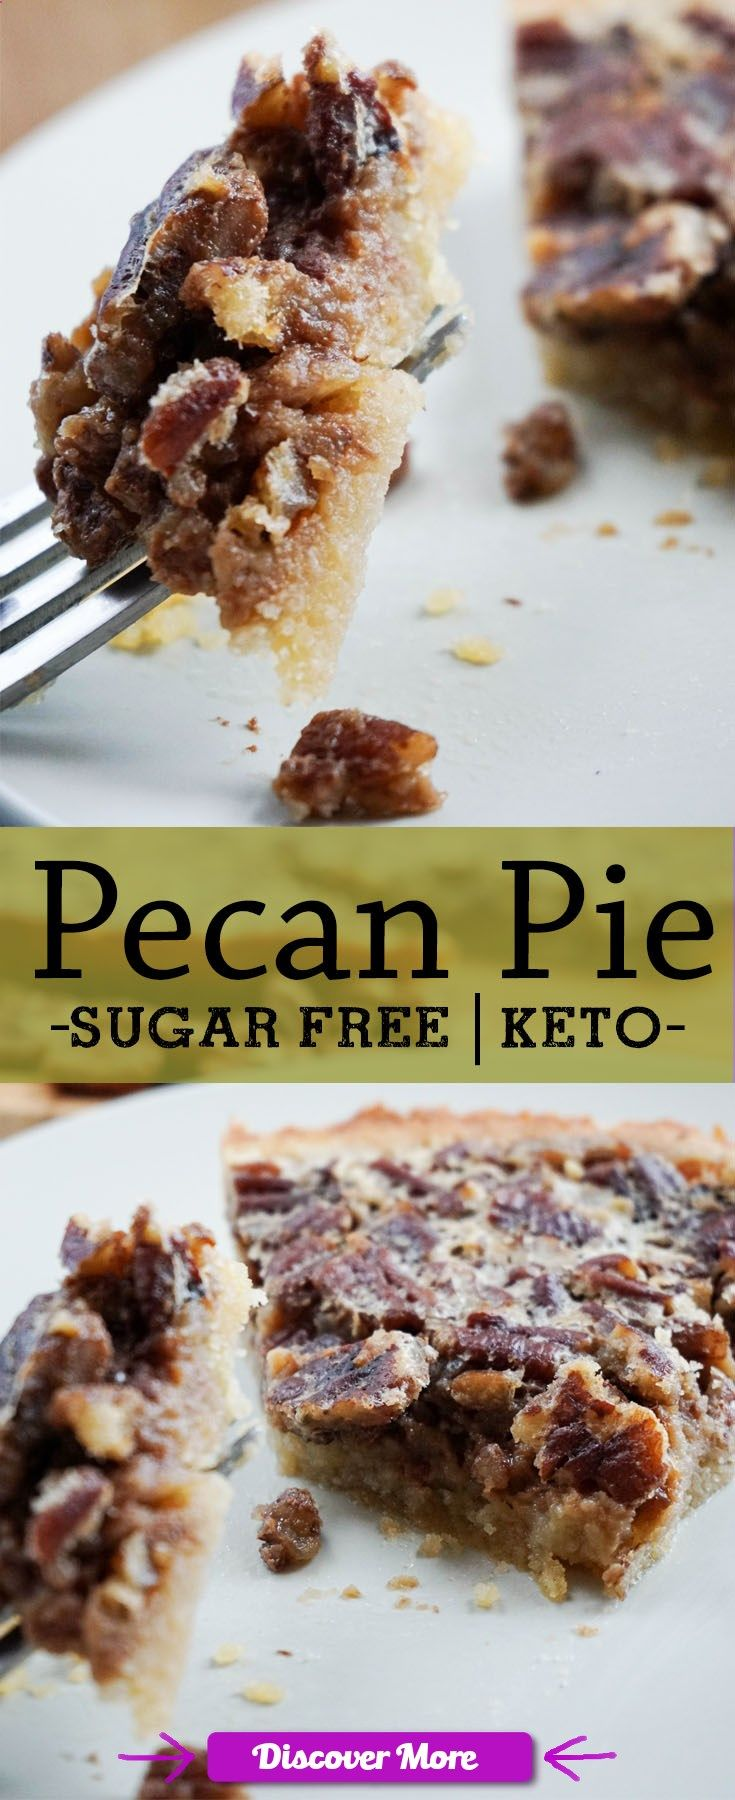 A Guilt Free, Low Carb Pecan Pie at last!